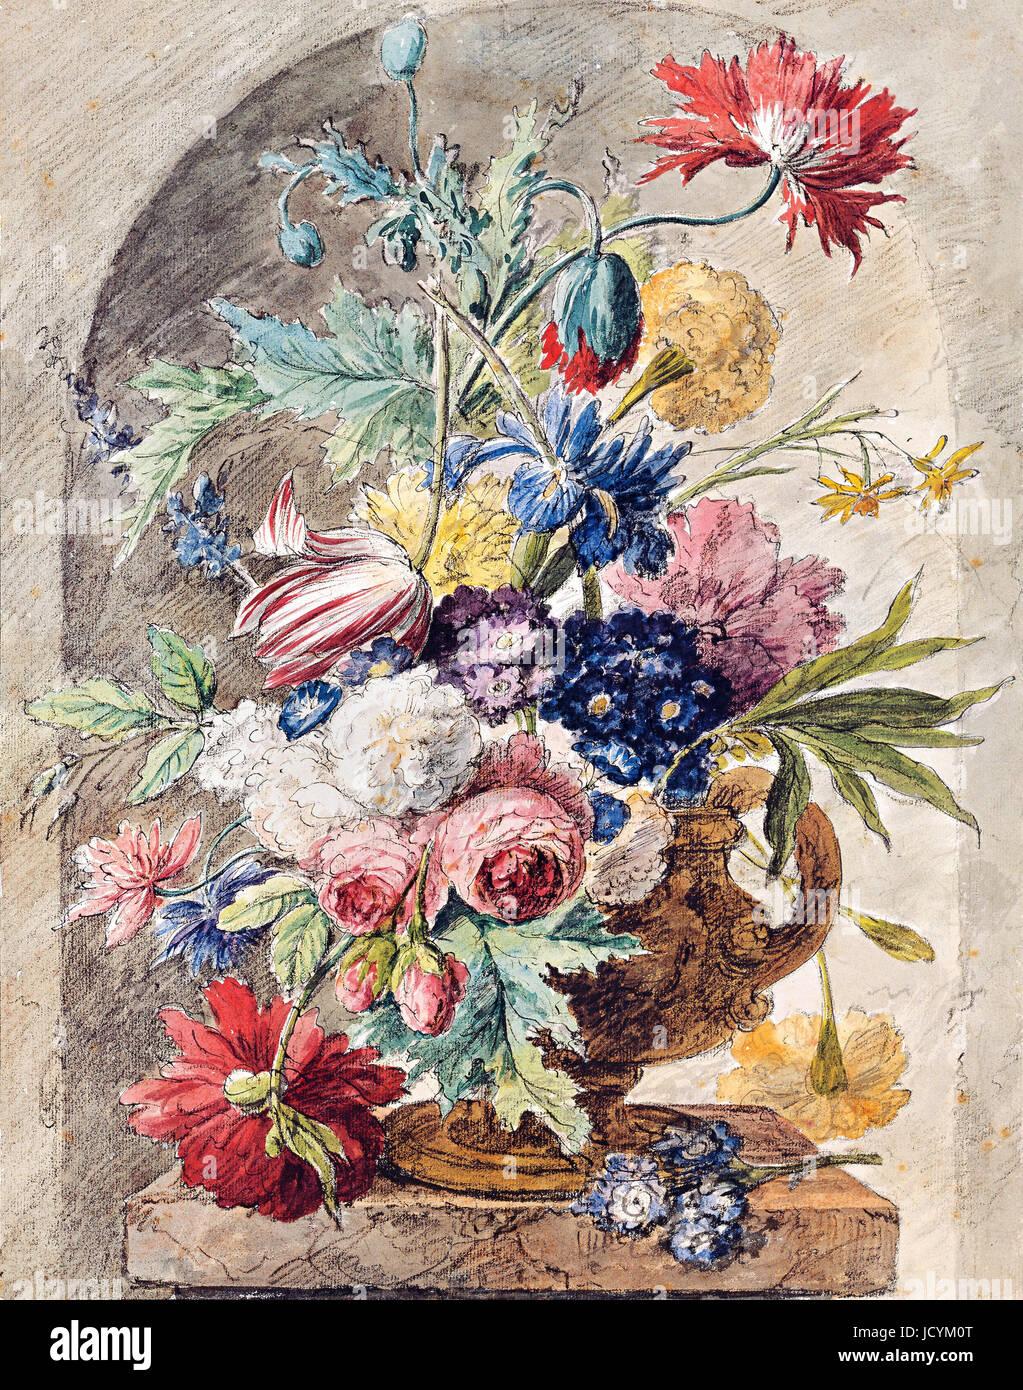 Jan van Huysum, Flower Still Life 1722 Oil on panel. Drawing: black chalk, pen, ink, watercolor. Albertina, Vienna, - Stock Image